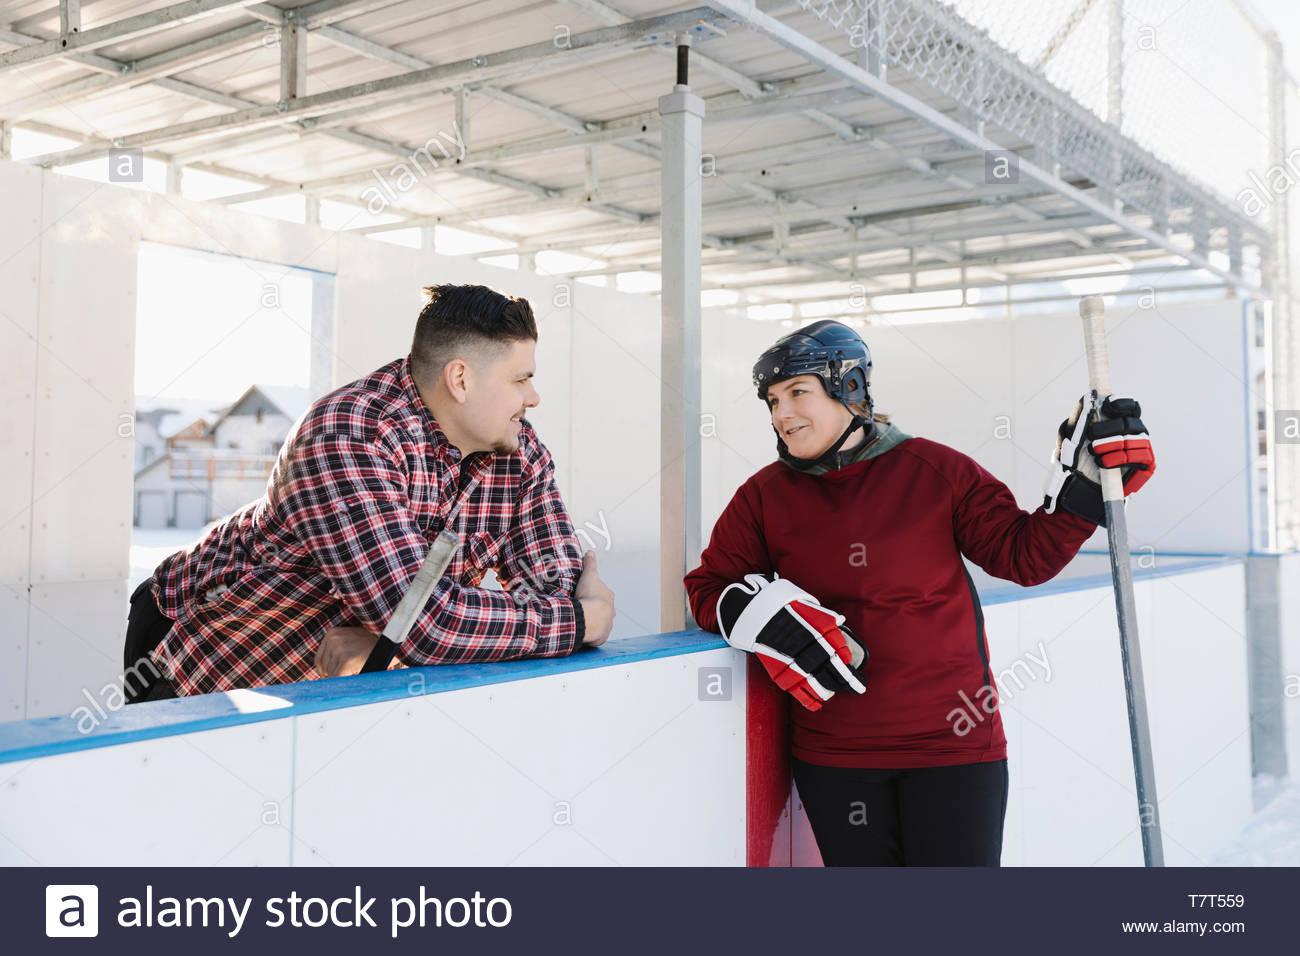 Couple playing hockey sur glace en plein air Photo Stock